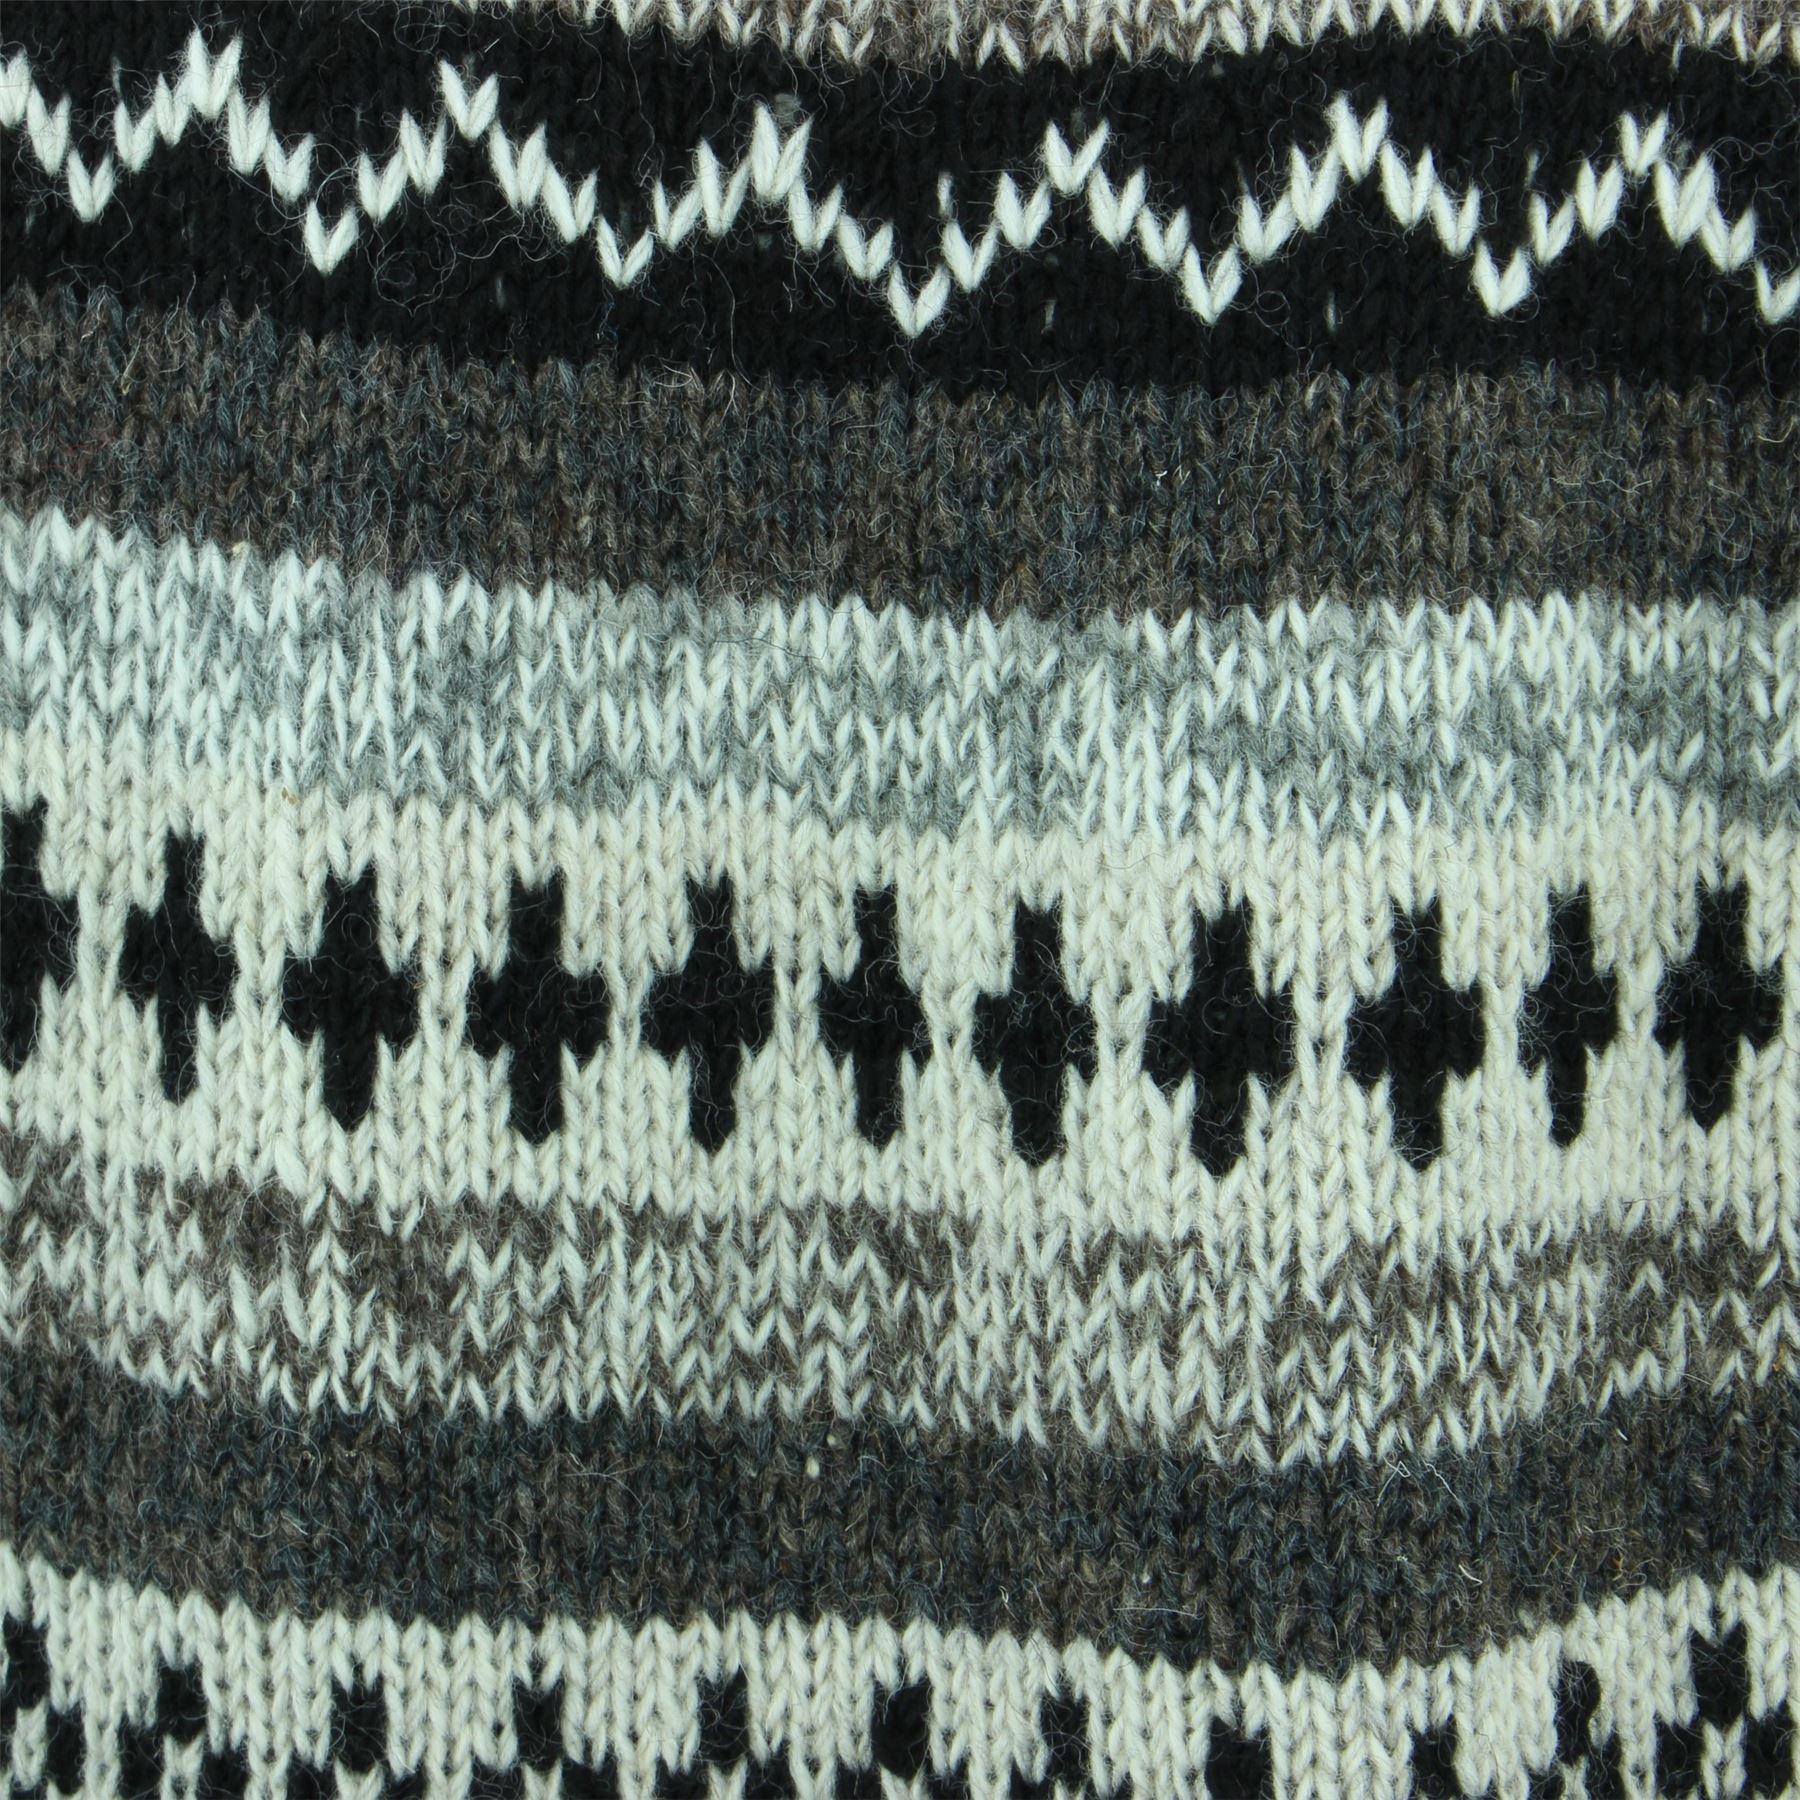 thumbnail 14 - Wool Knit Jumper Sweater Pullover Fairisle Nordic Abstract Warm Nepal Loose